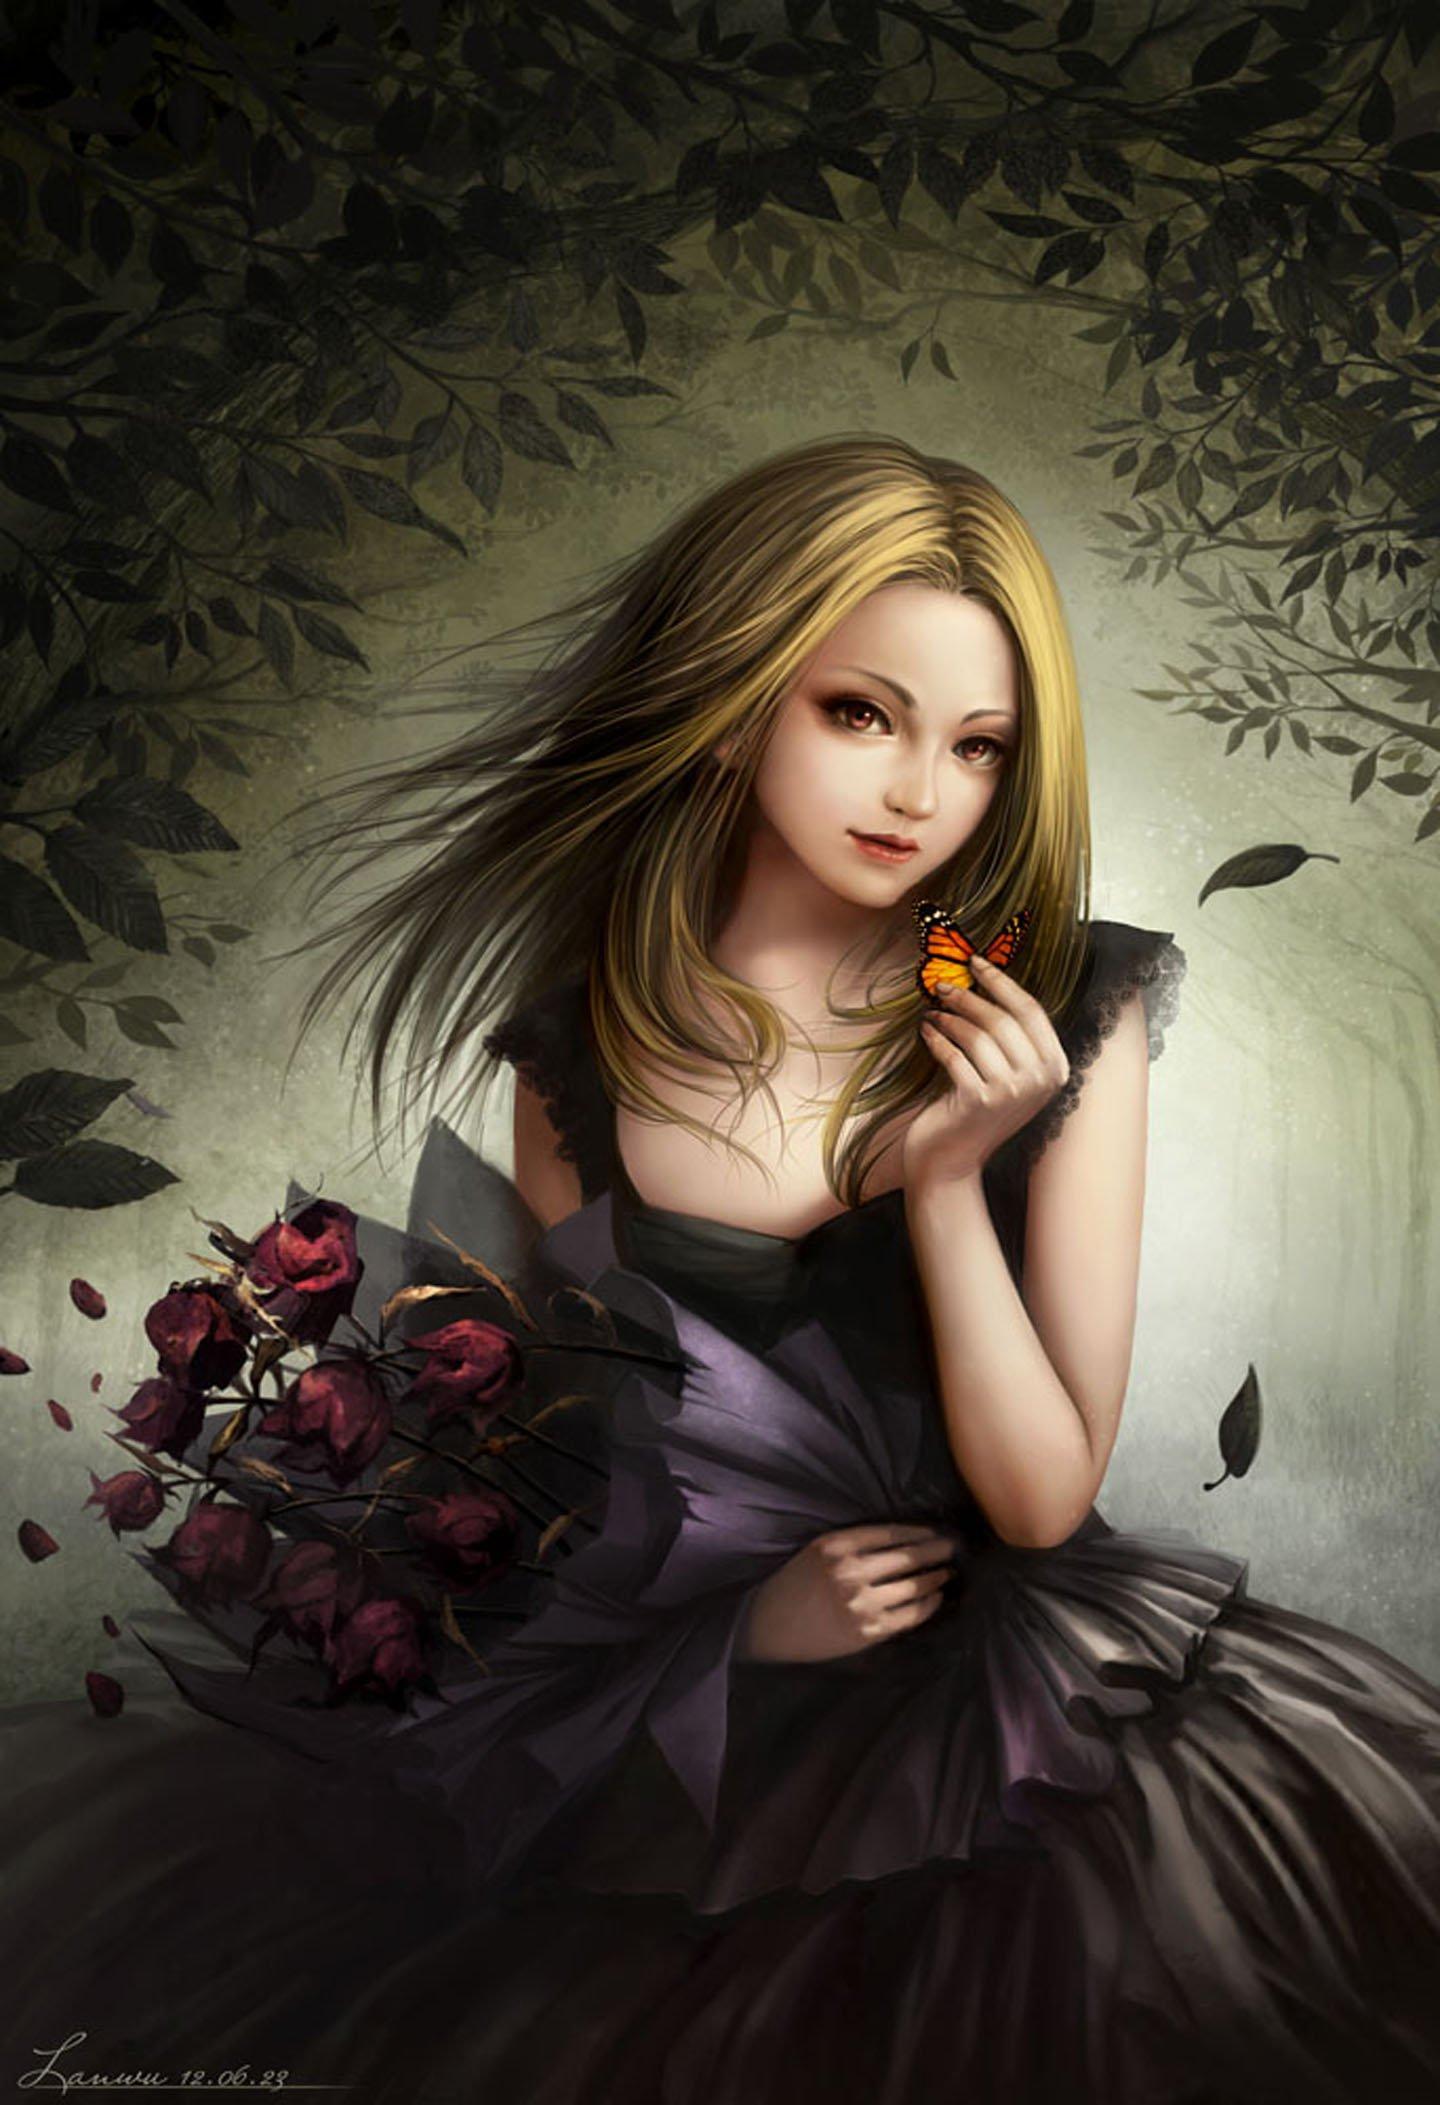 Dress long hair beautiful girl anime flower wallpaper - Beautiful girl anime wallpaper ...